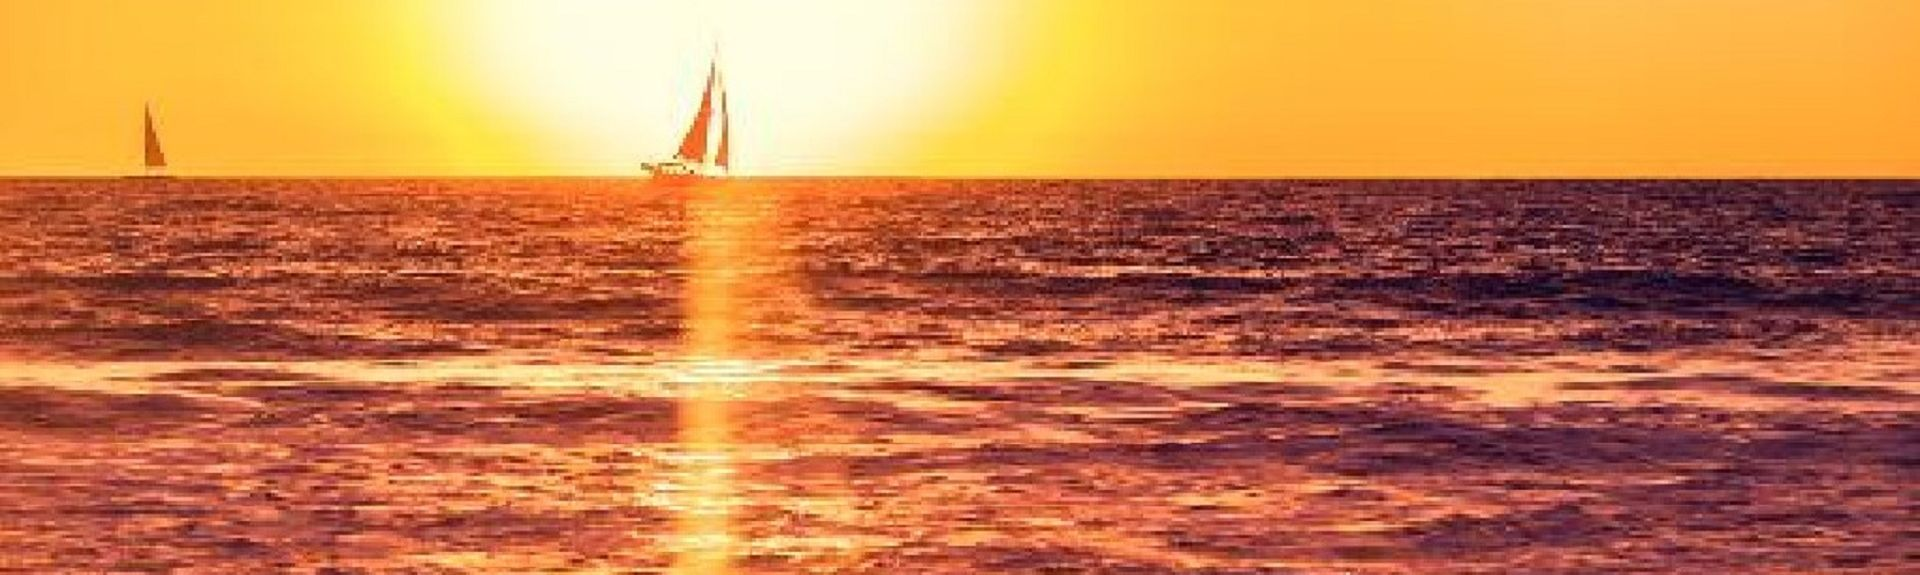 Playa Vista, California, United States of America